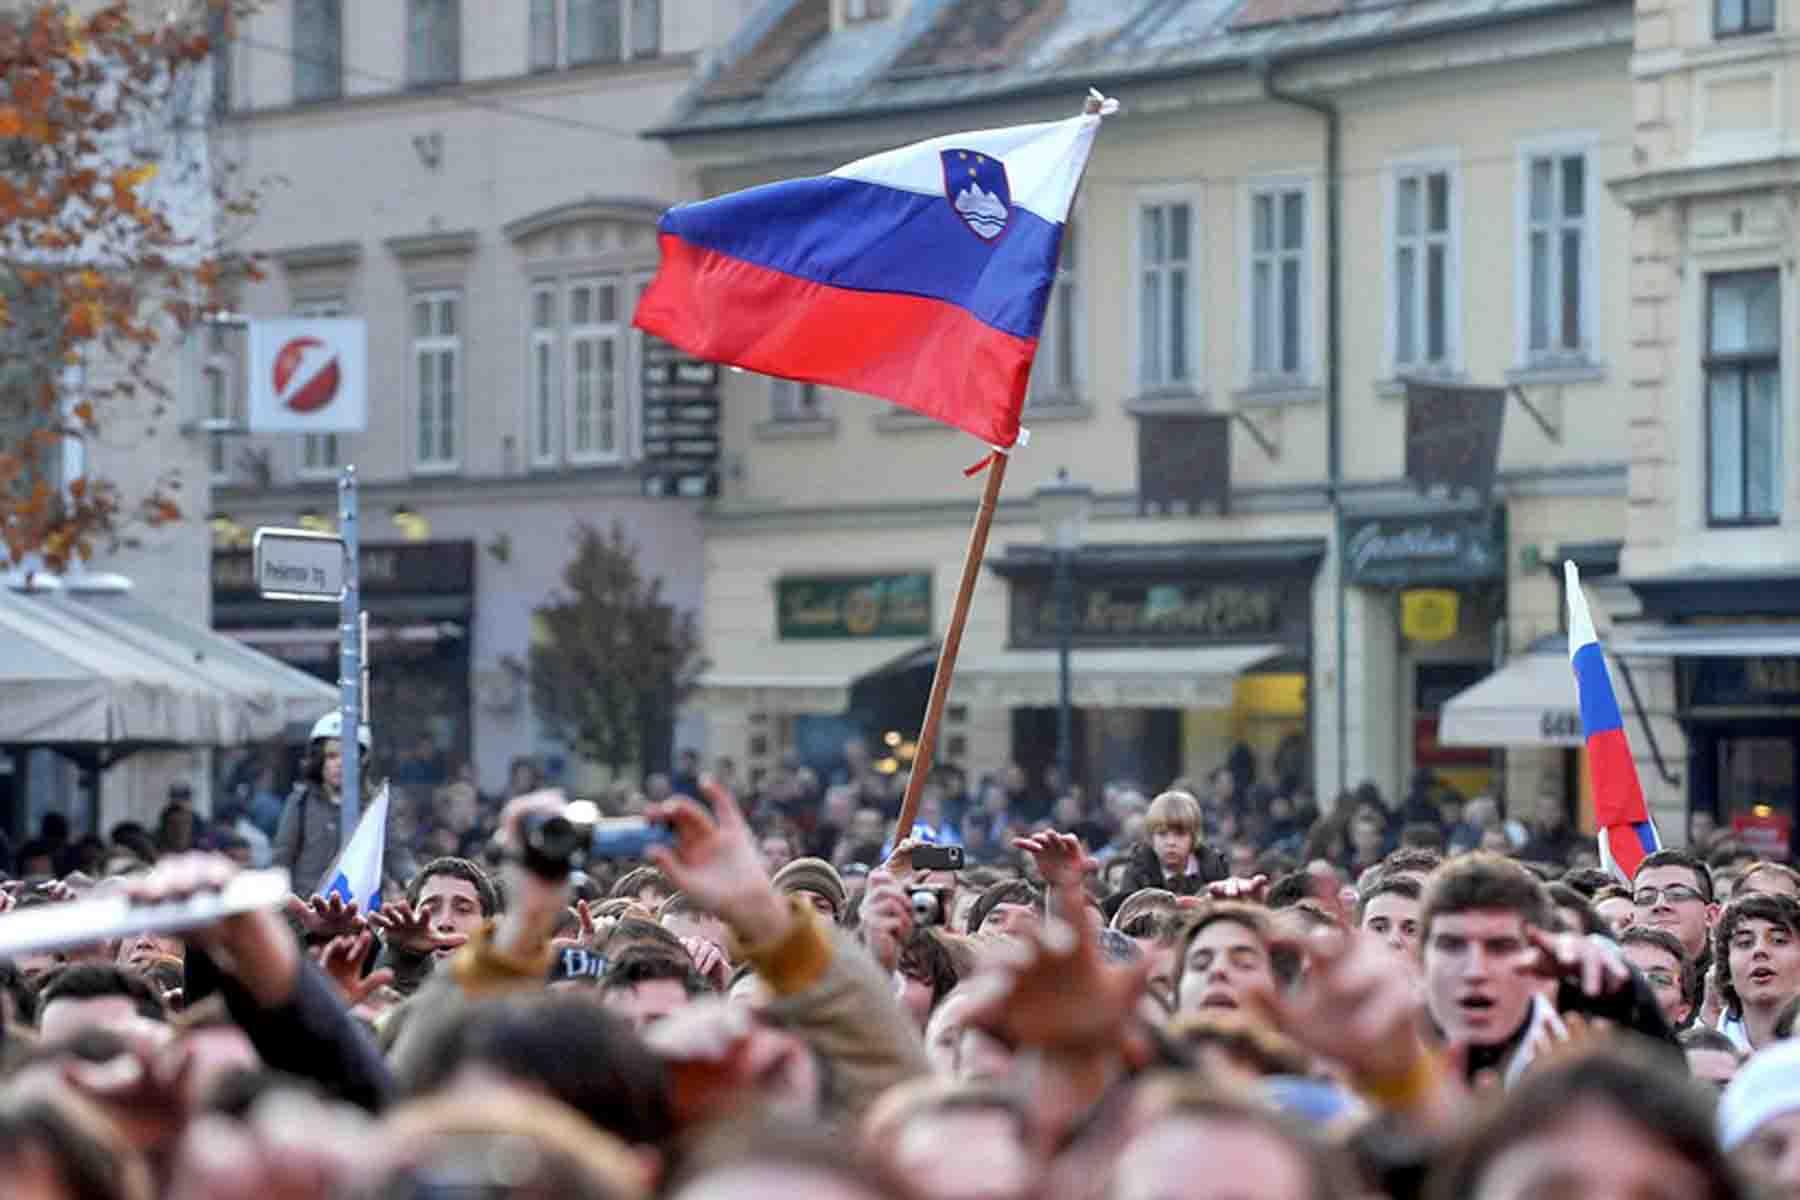 Susret sa slovenskim predsjednikom Pahorom